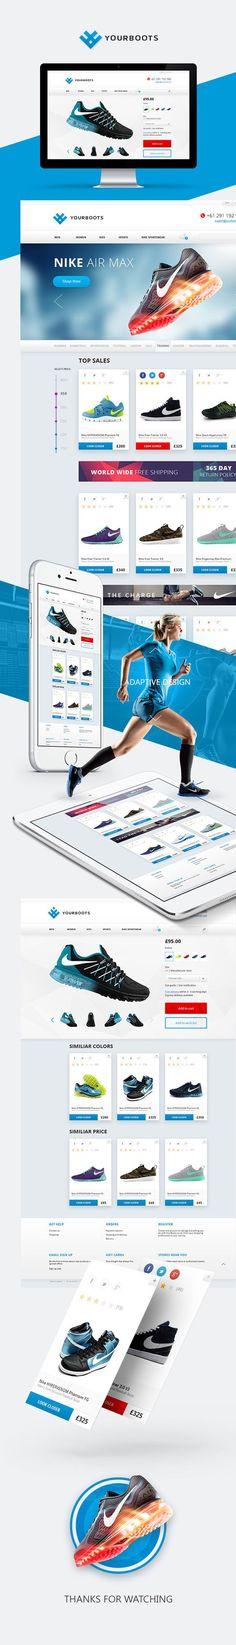 YourBoots - fancy and sporty footwear e-Shop on Behance: